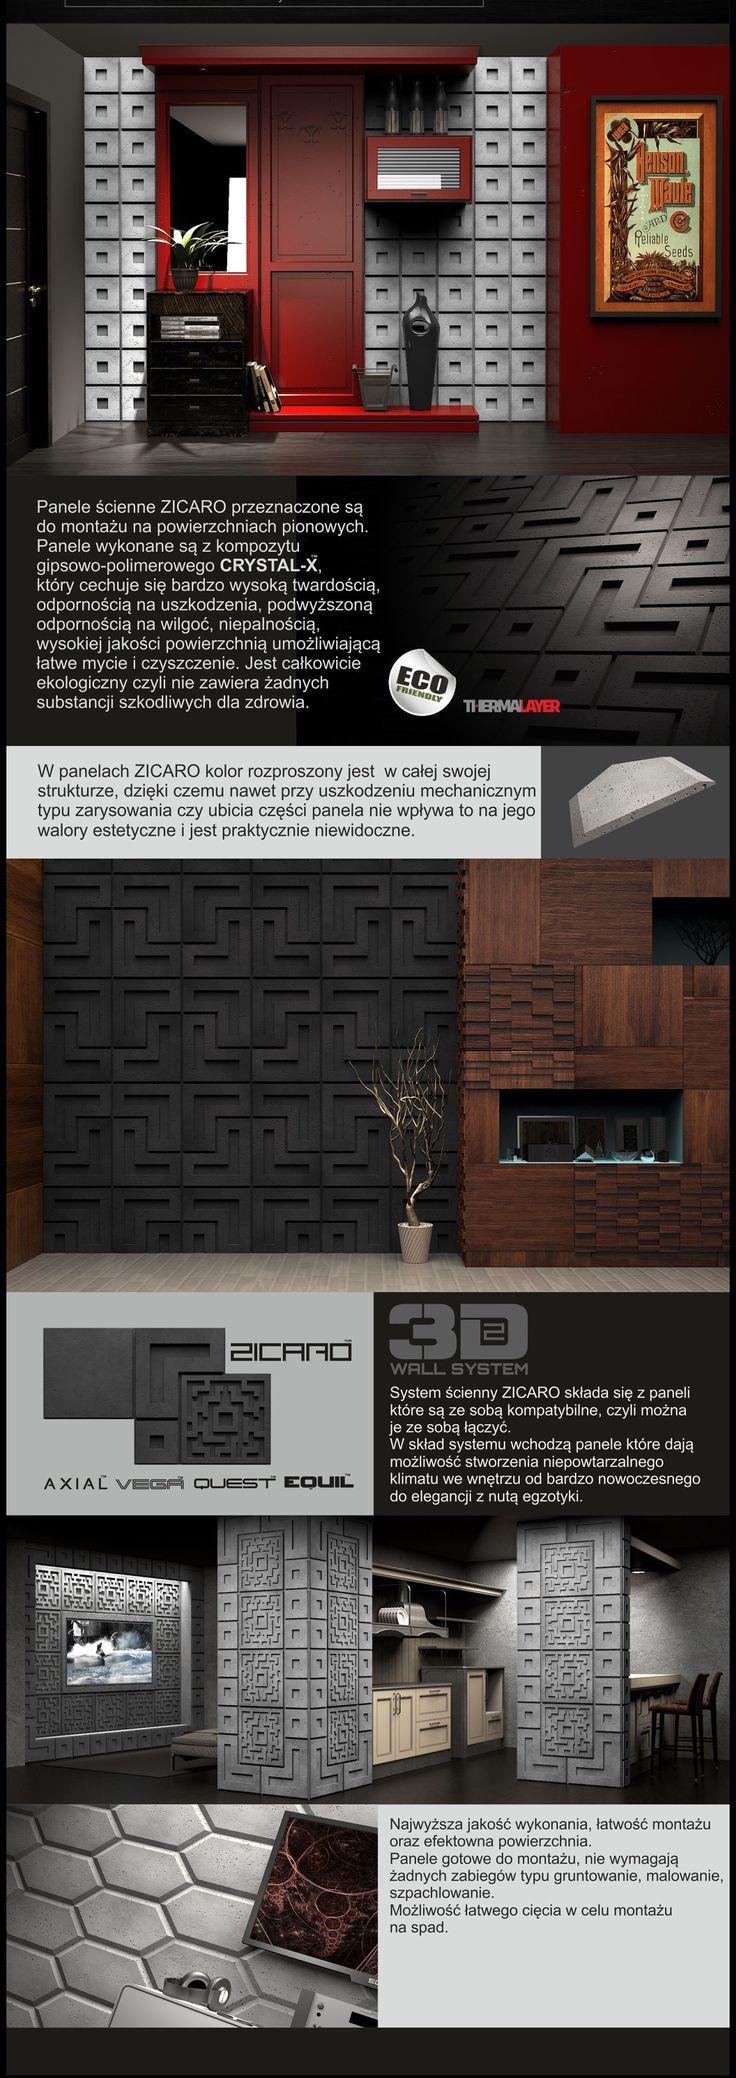 ZICARO - producent - panele ścienne 3D